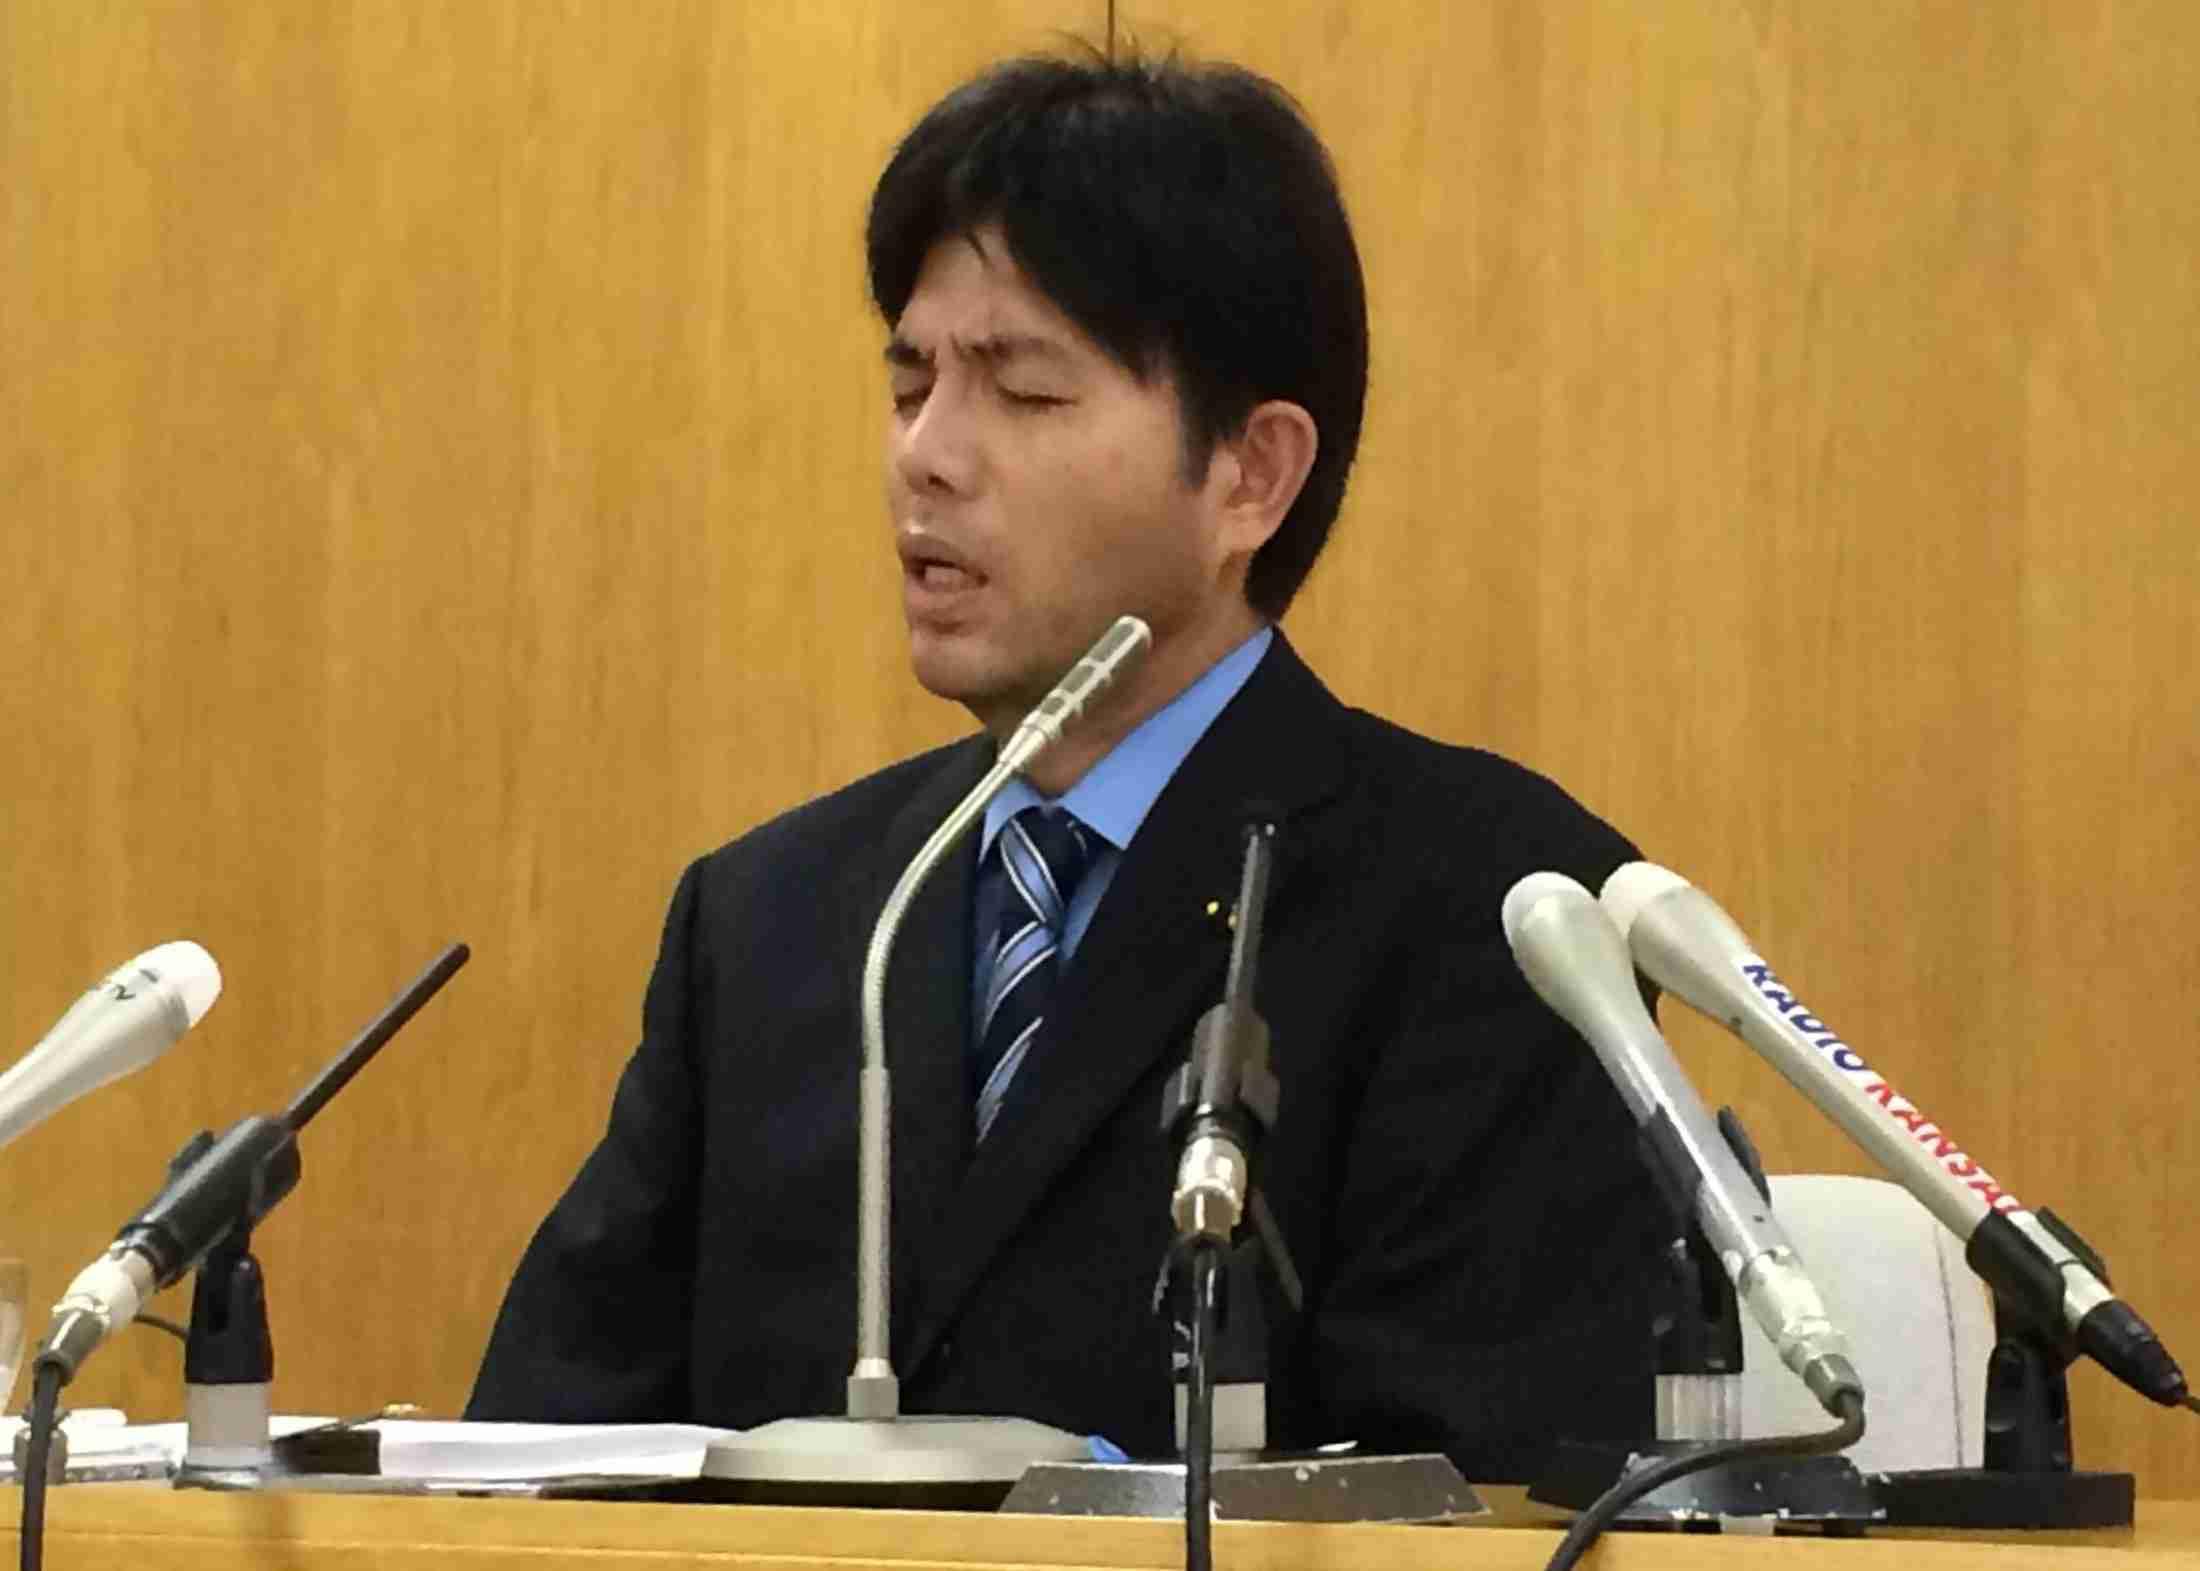 <野々村元県議>懲役3年、執行猶予4年の判決 神戸地裁 (毎日新聞) - Yahoo!ニュース